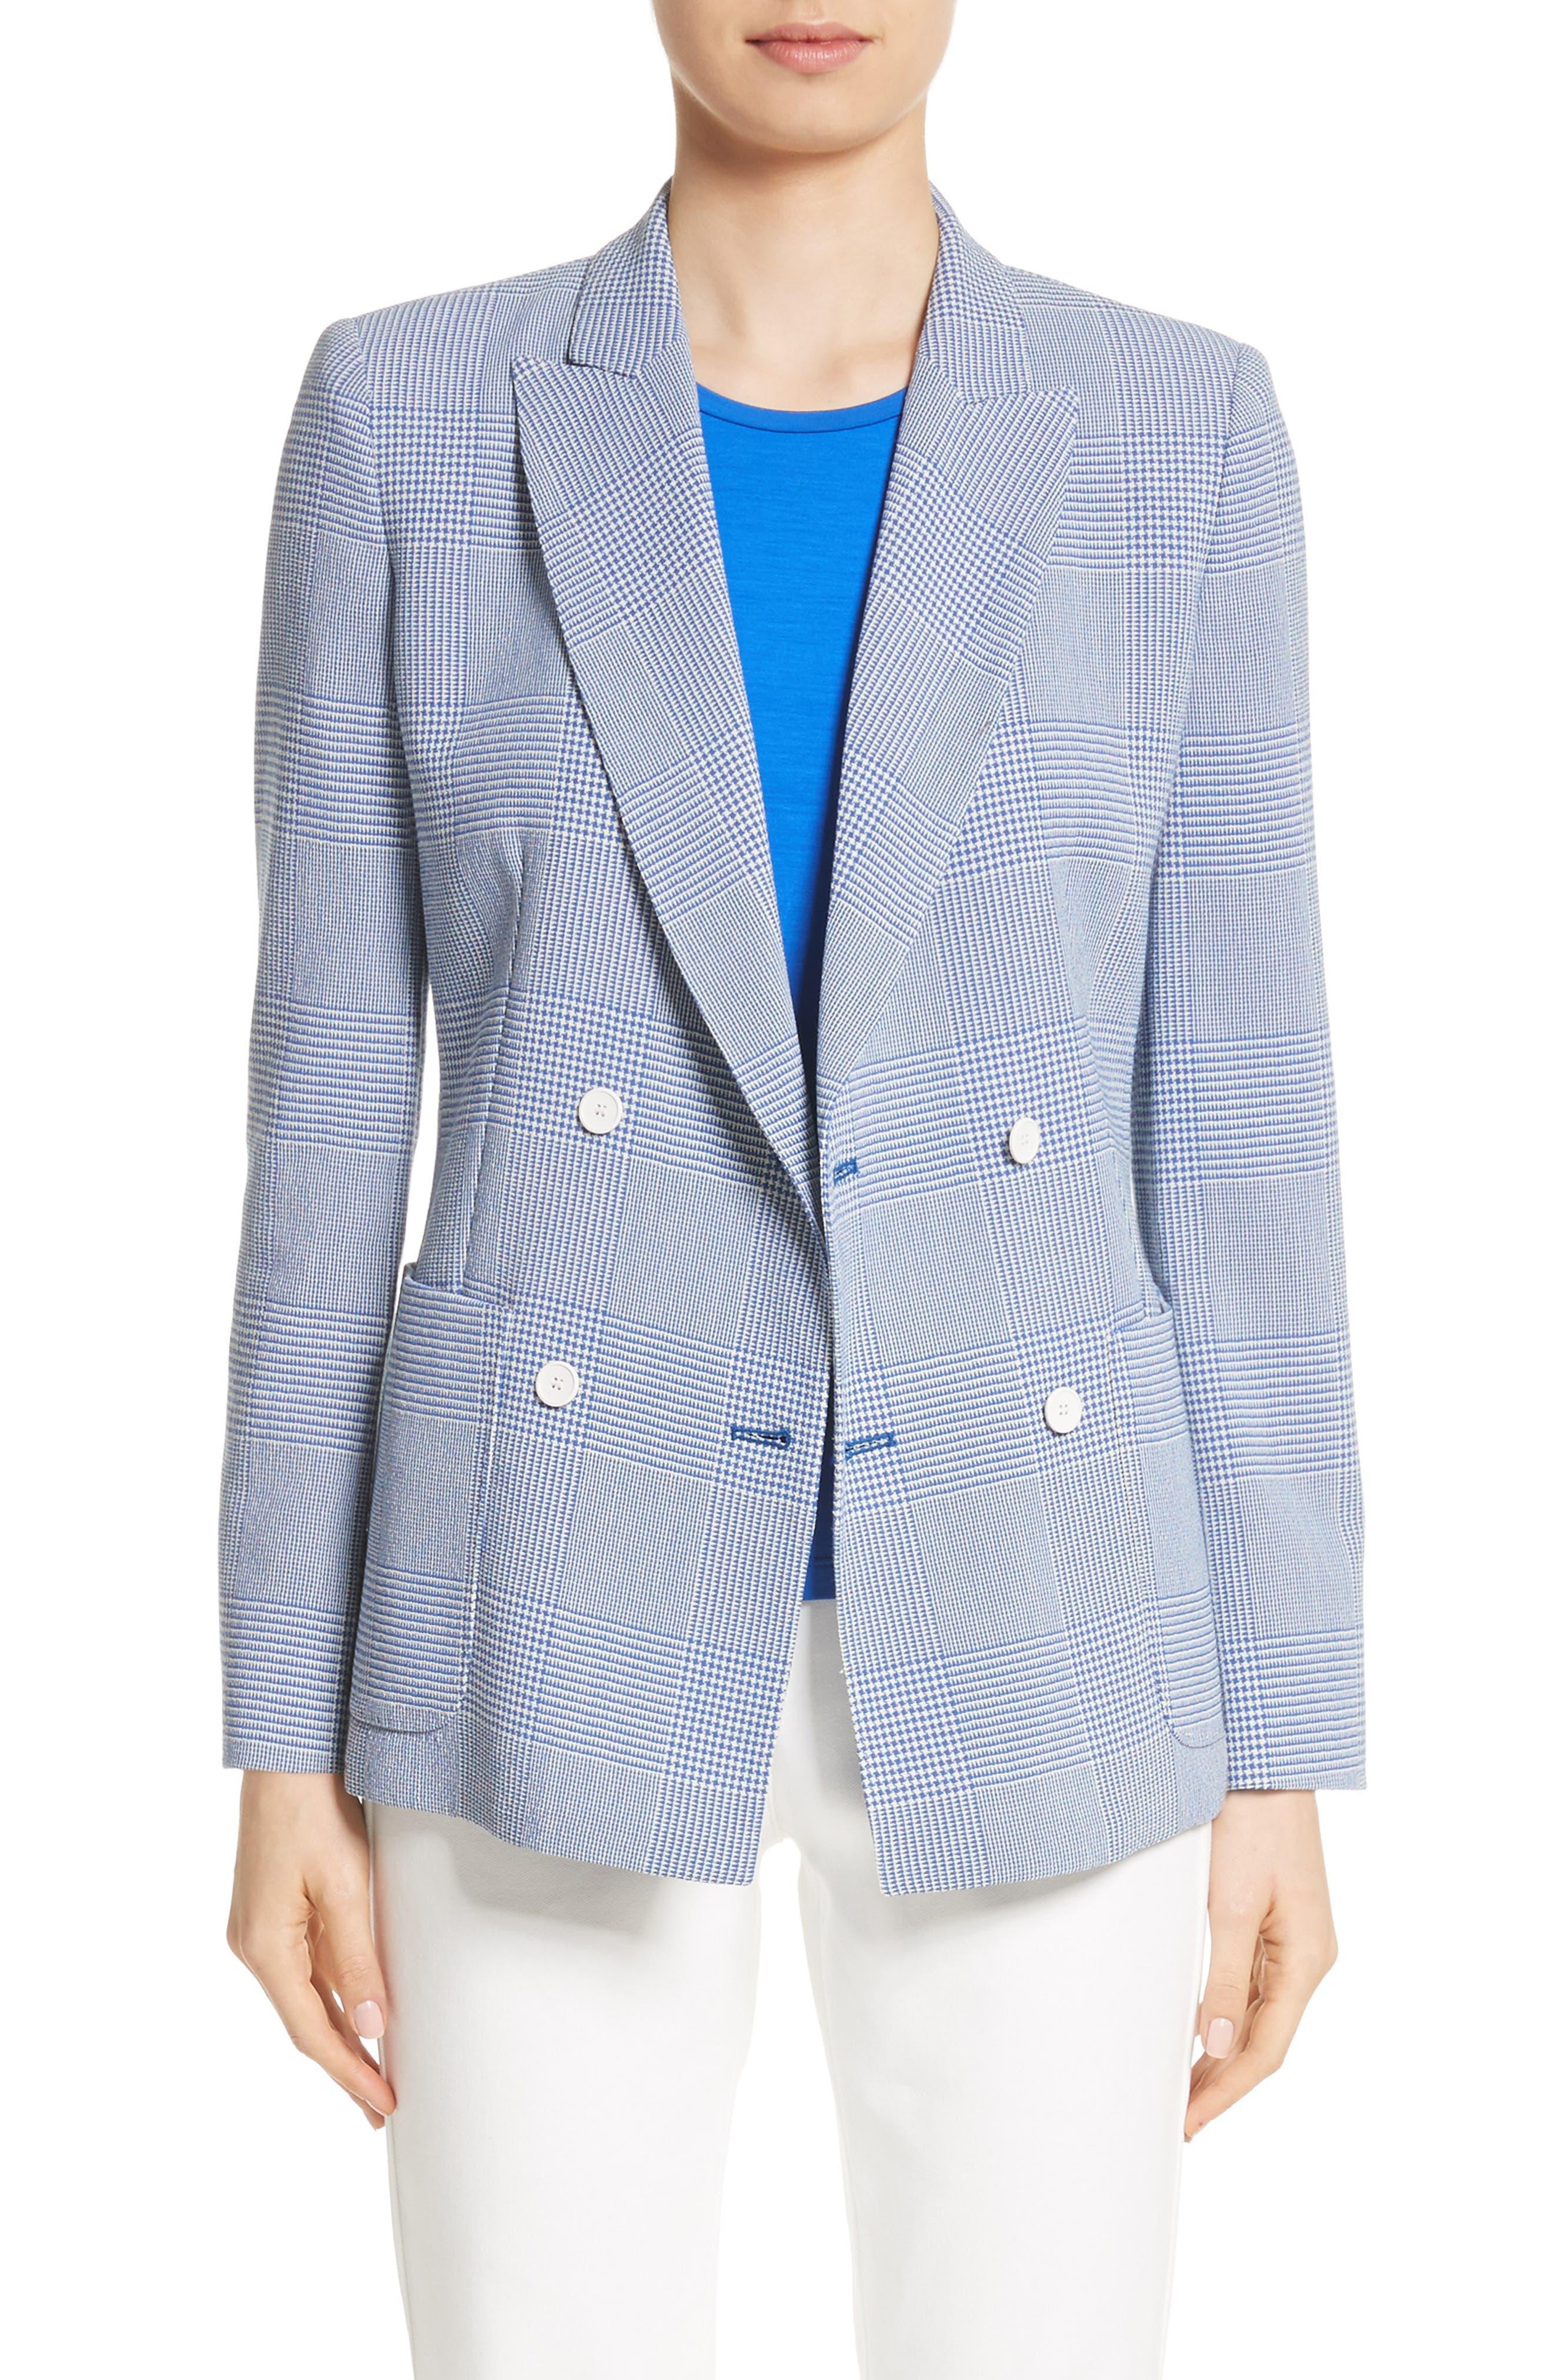 Ballata Check Wool Blazer,                             Main thumbnail 1, color,                             404